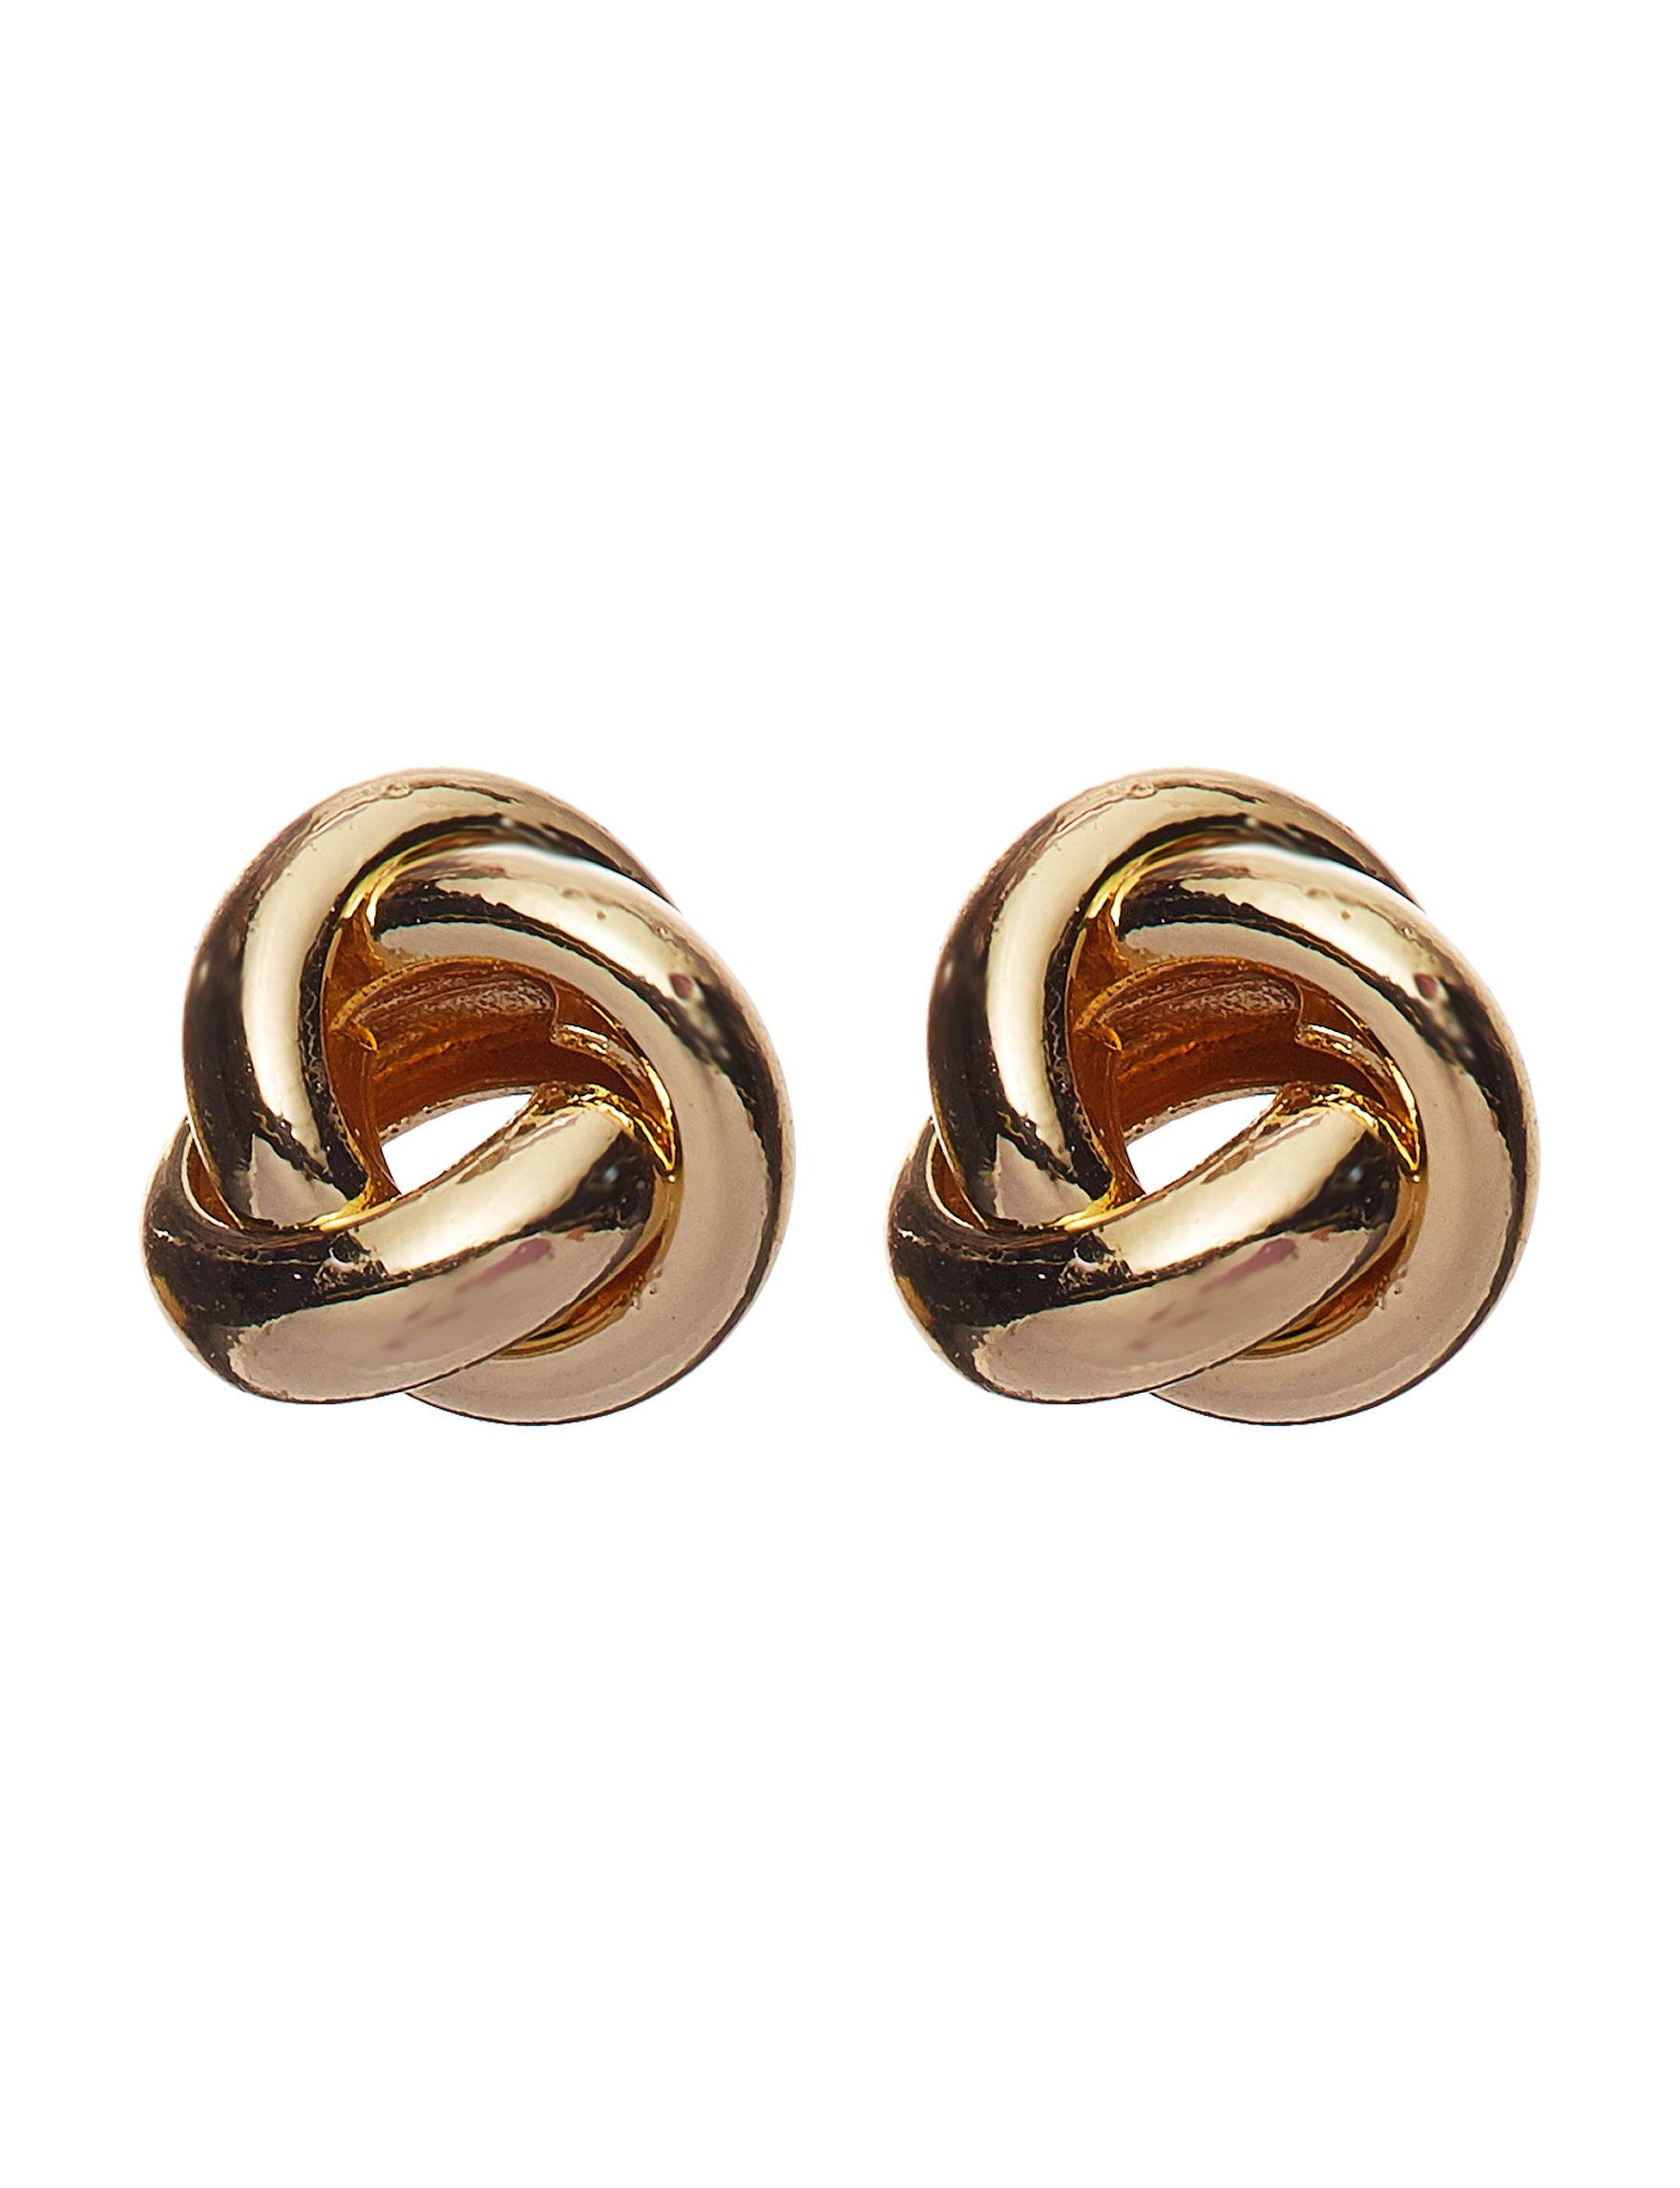 Roman Gold Studs Earrings Fashion Jewelry